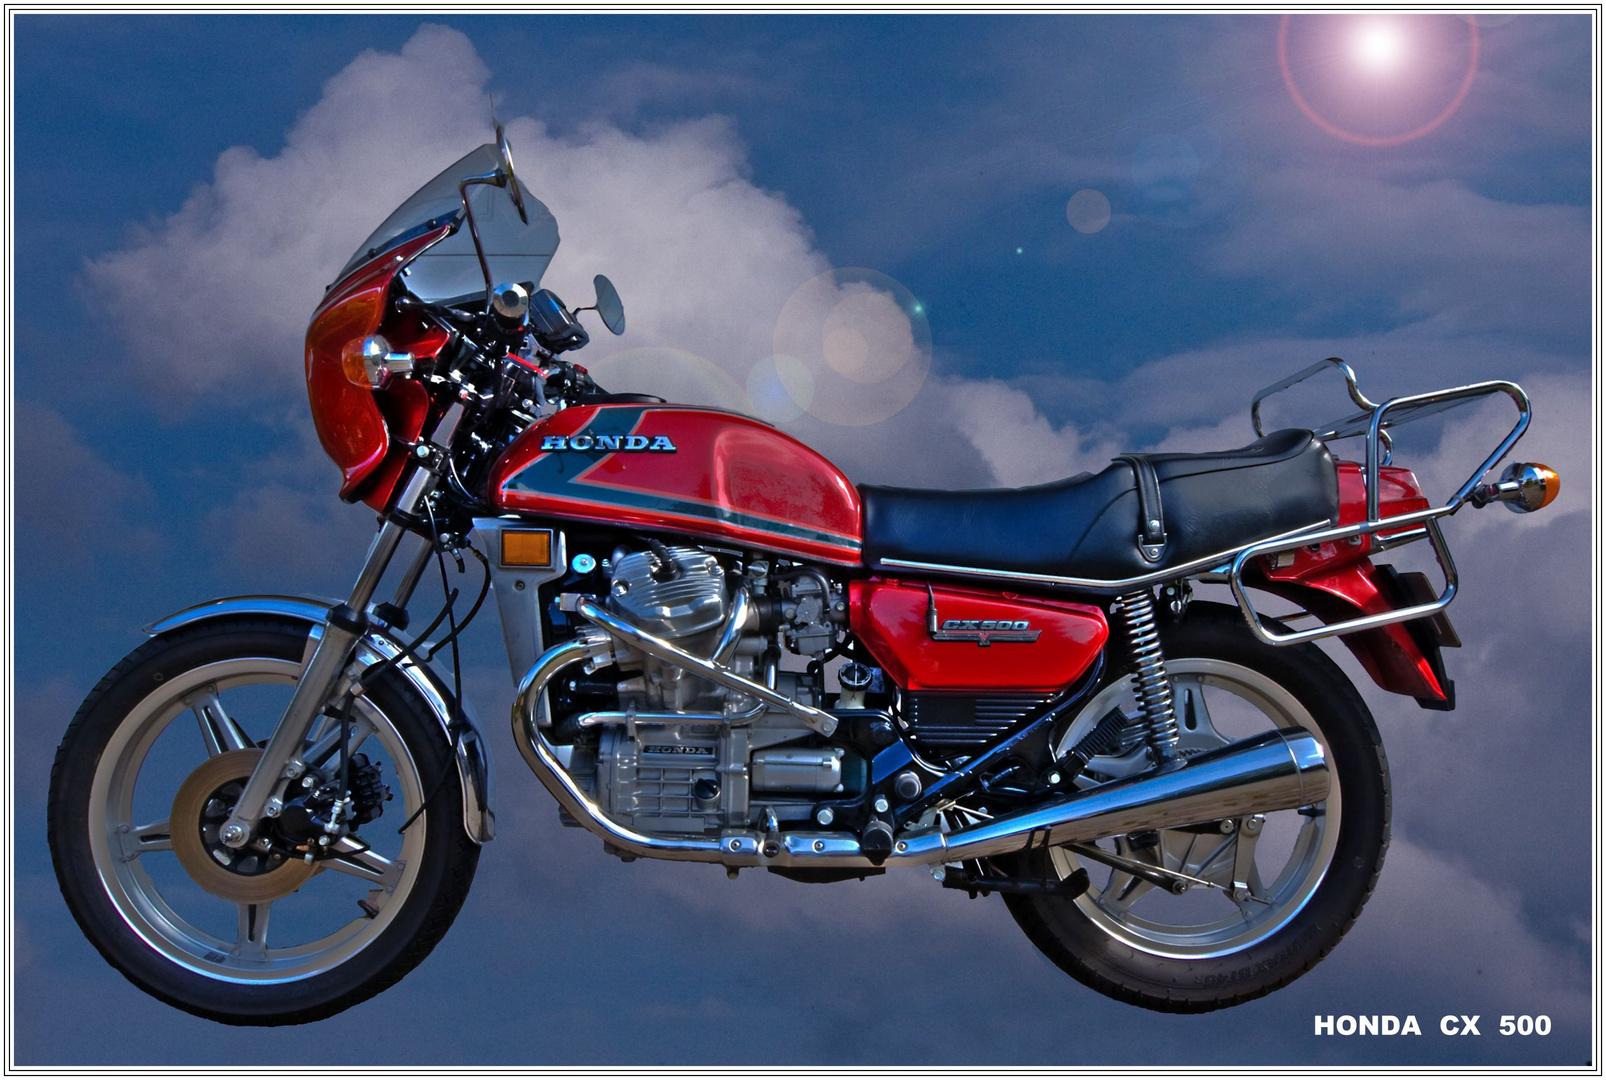 Umgebautes Motorrad Honda CX 500 von Motorradhaus GEDE